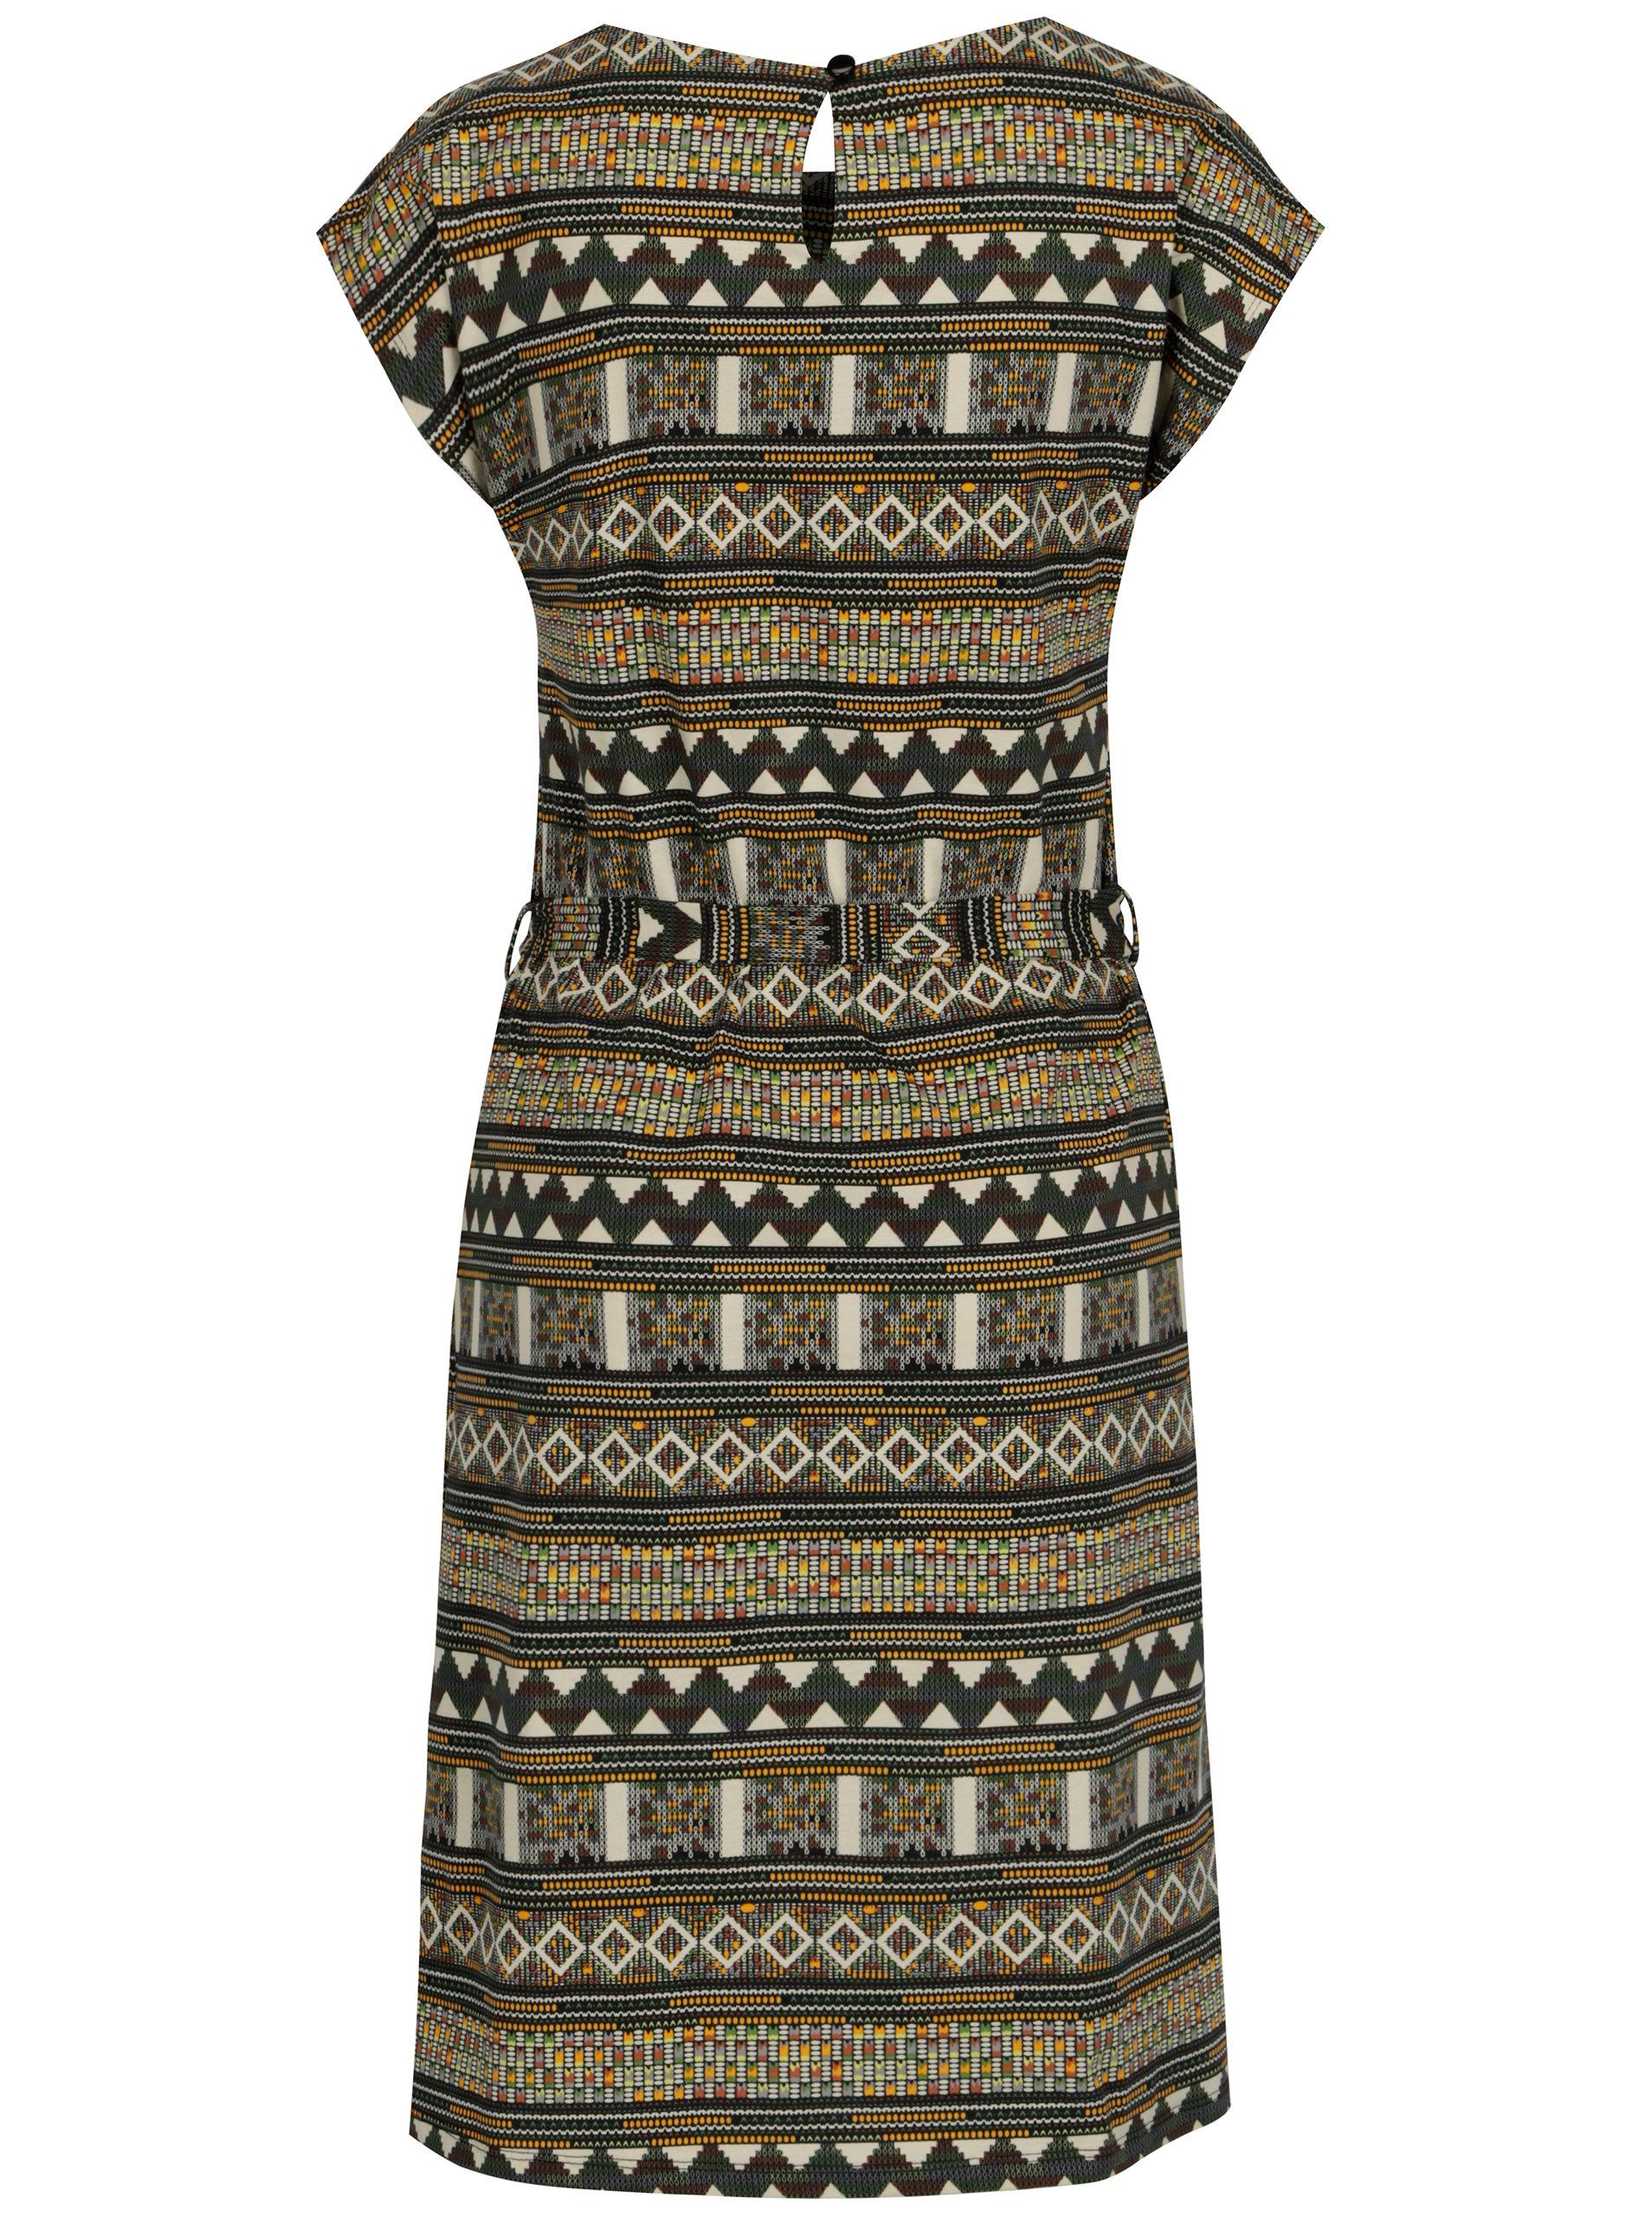 922844ab8908 Béžové vzorované šaty s páskem Smashed Lemon ...